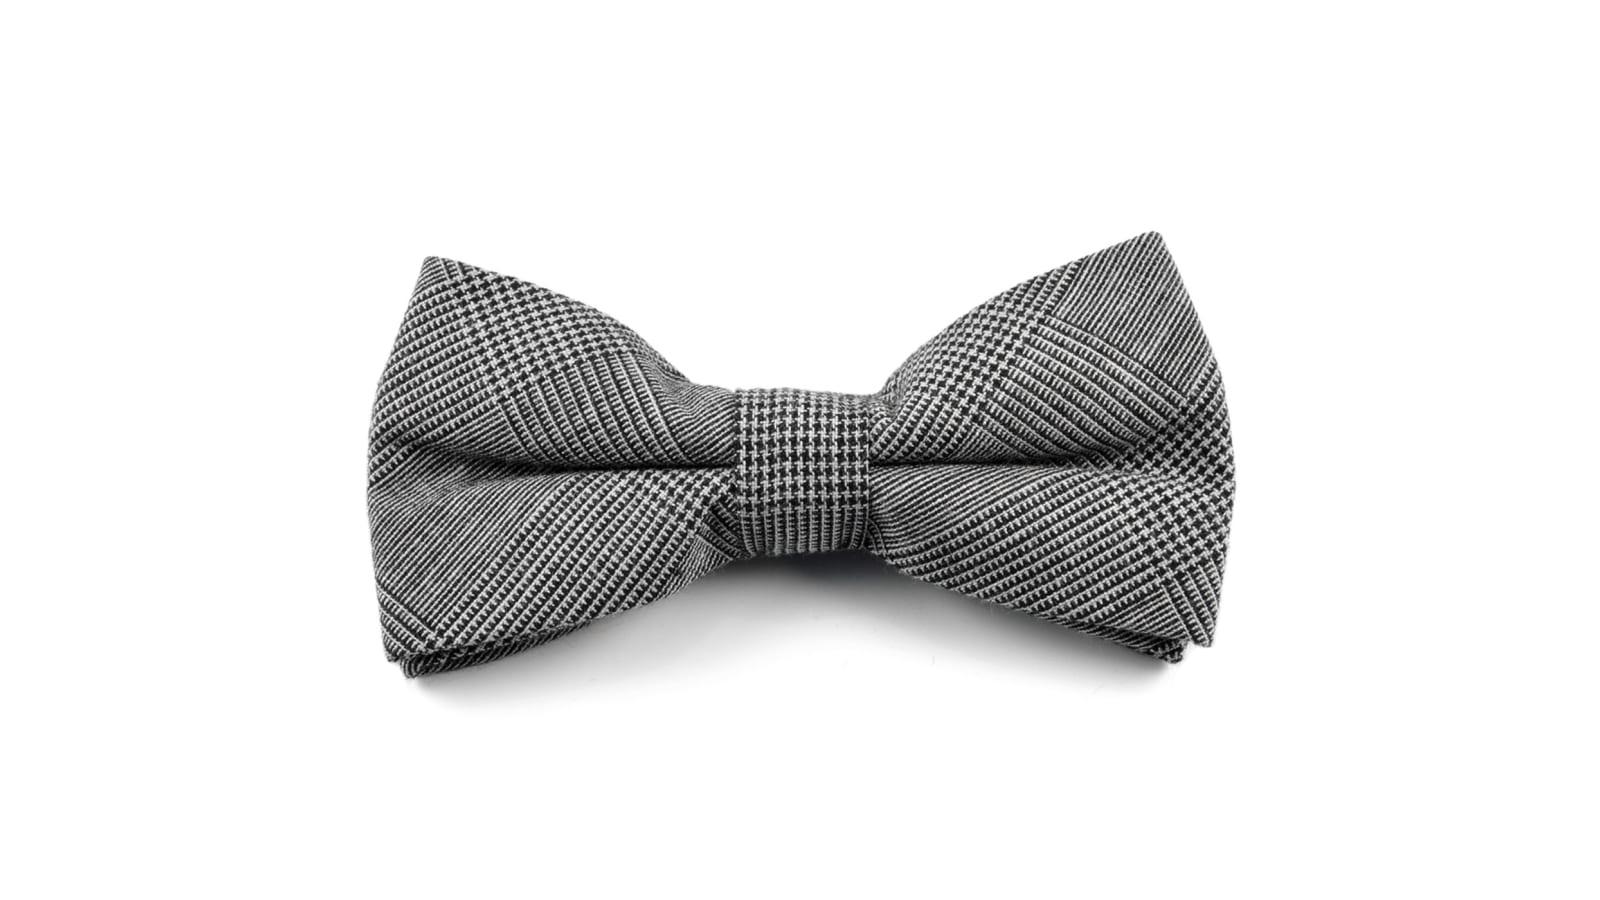 gentlemens bow tie day - HD1600×900